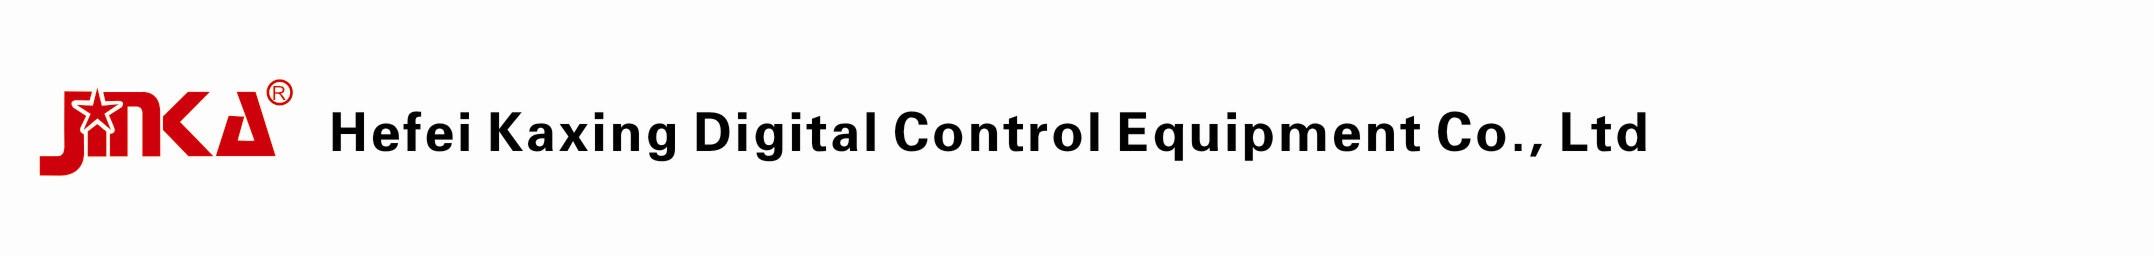 Hefei Kaxing Digital Control Equipment Co., Ltd